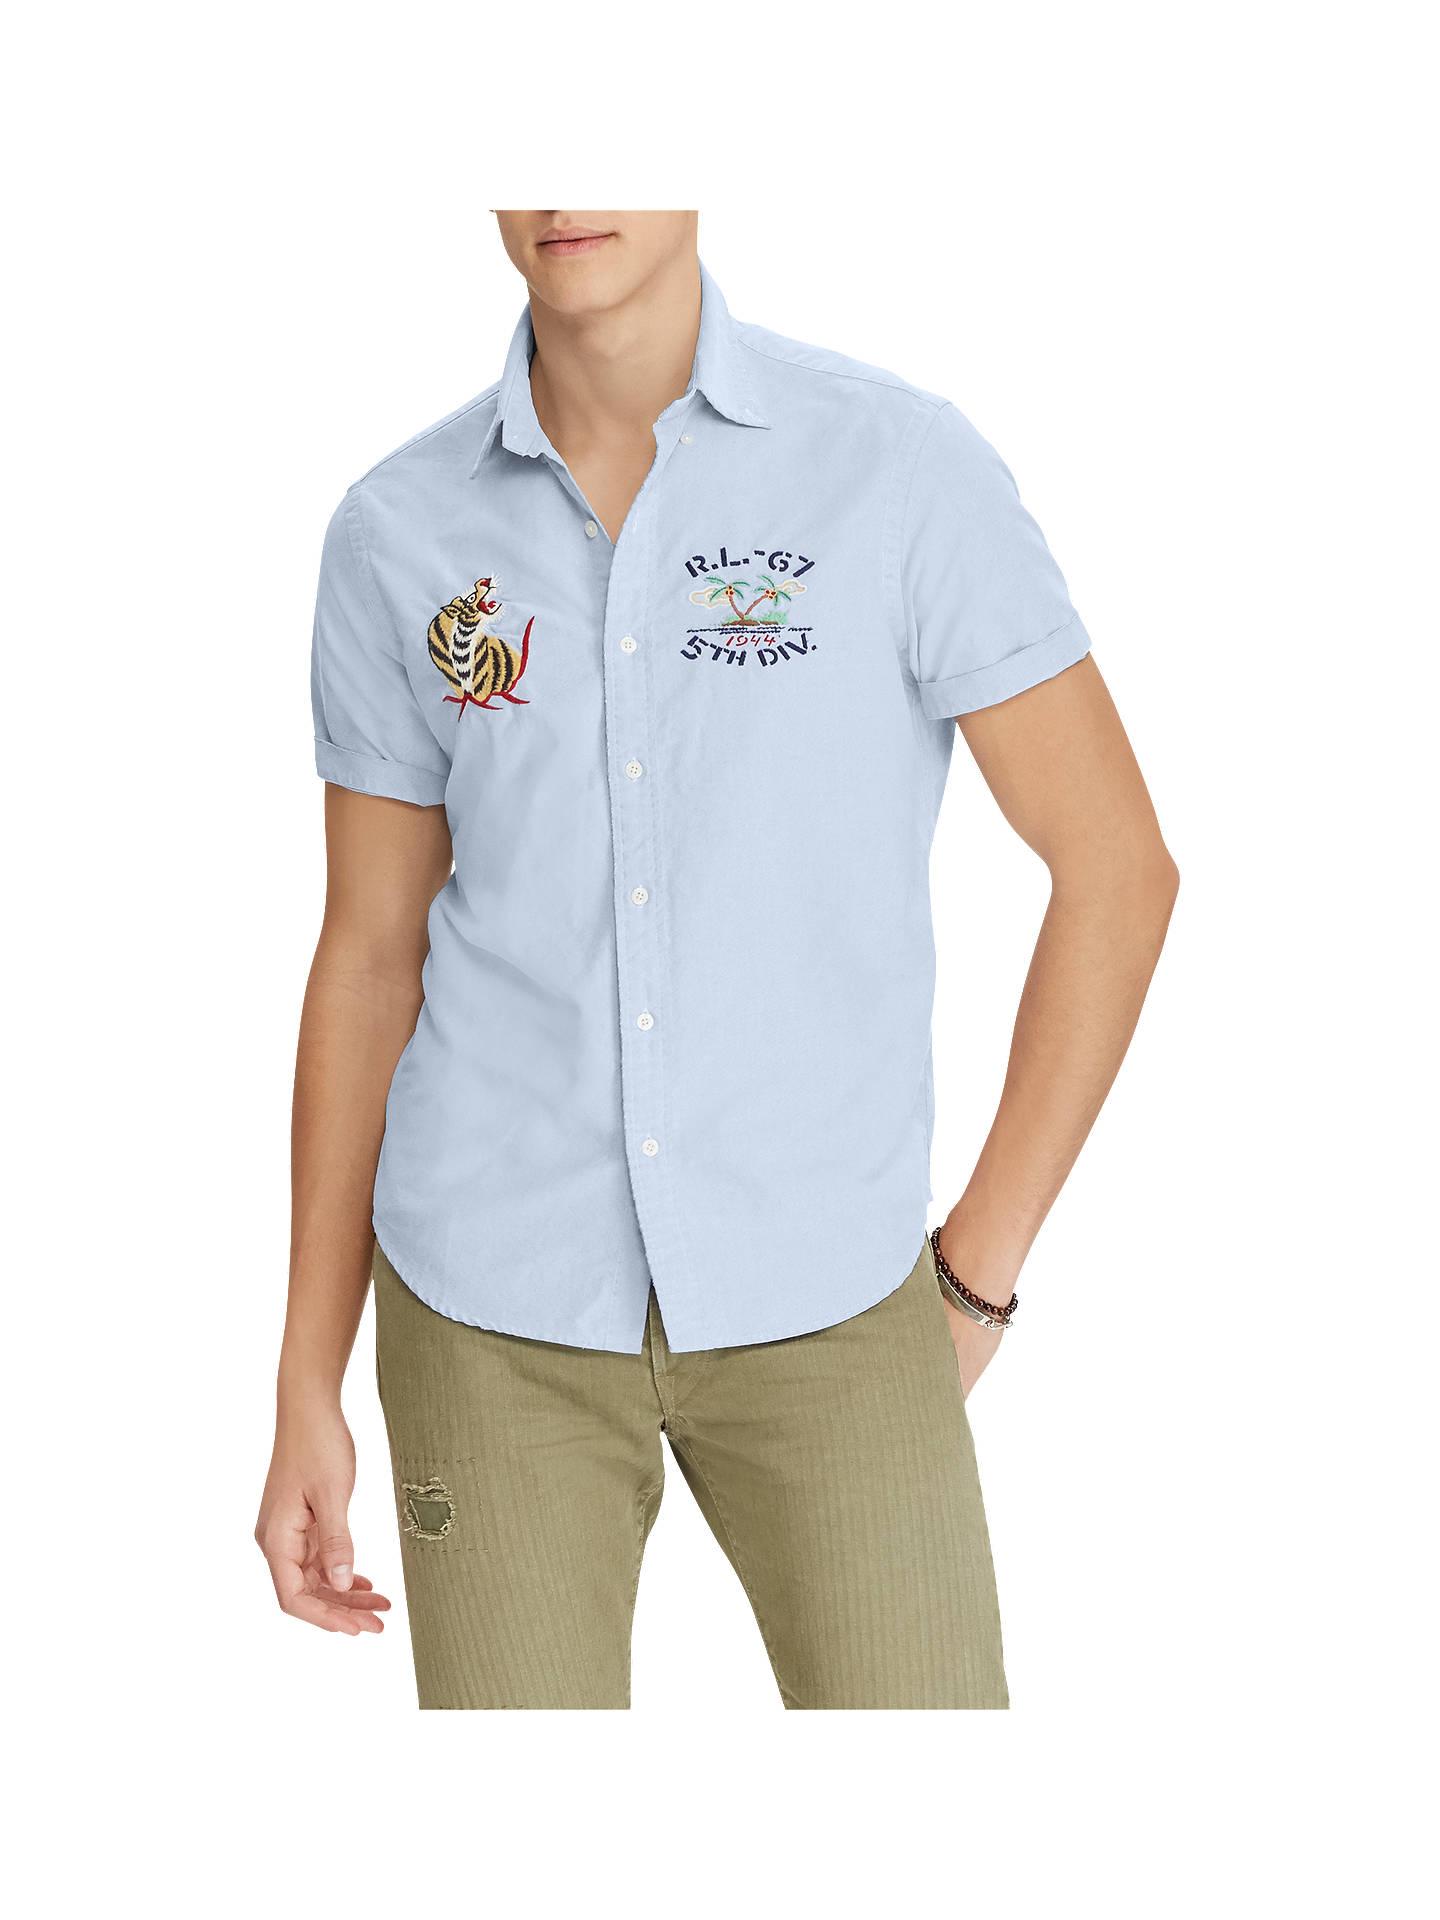 fdd43a4661cce Buy Polo Ralph Lauren Short Sleeve Hawaiian Print Shirt